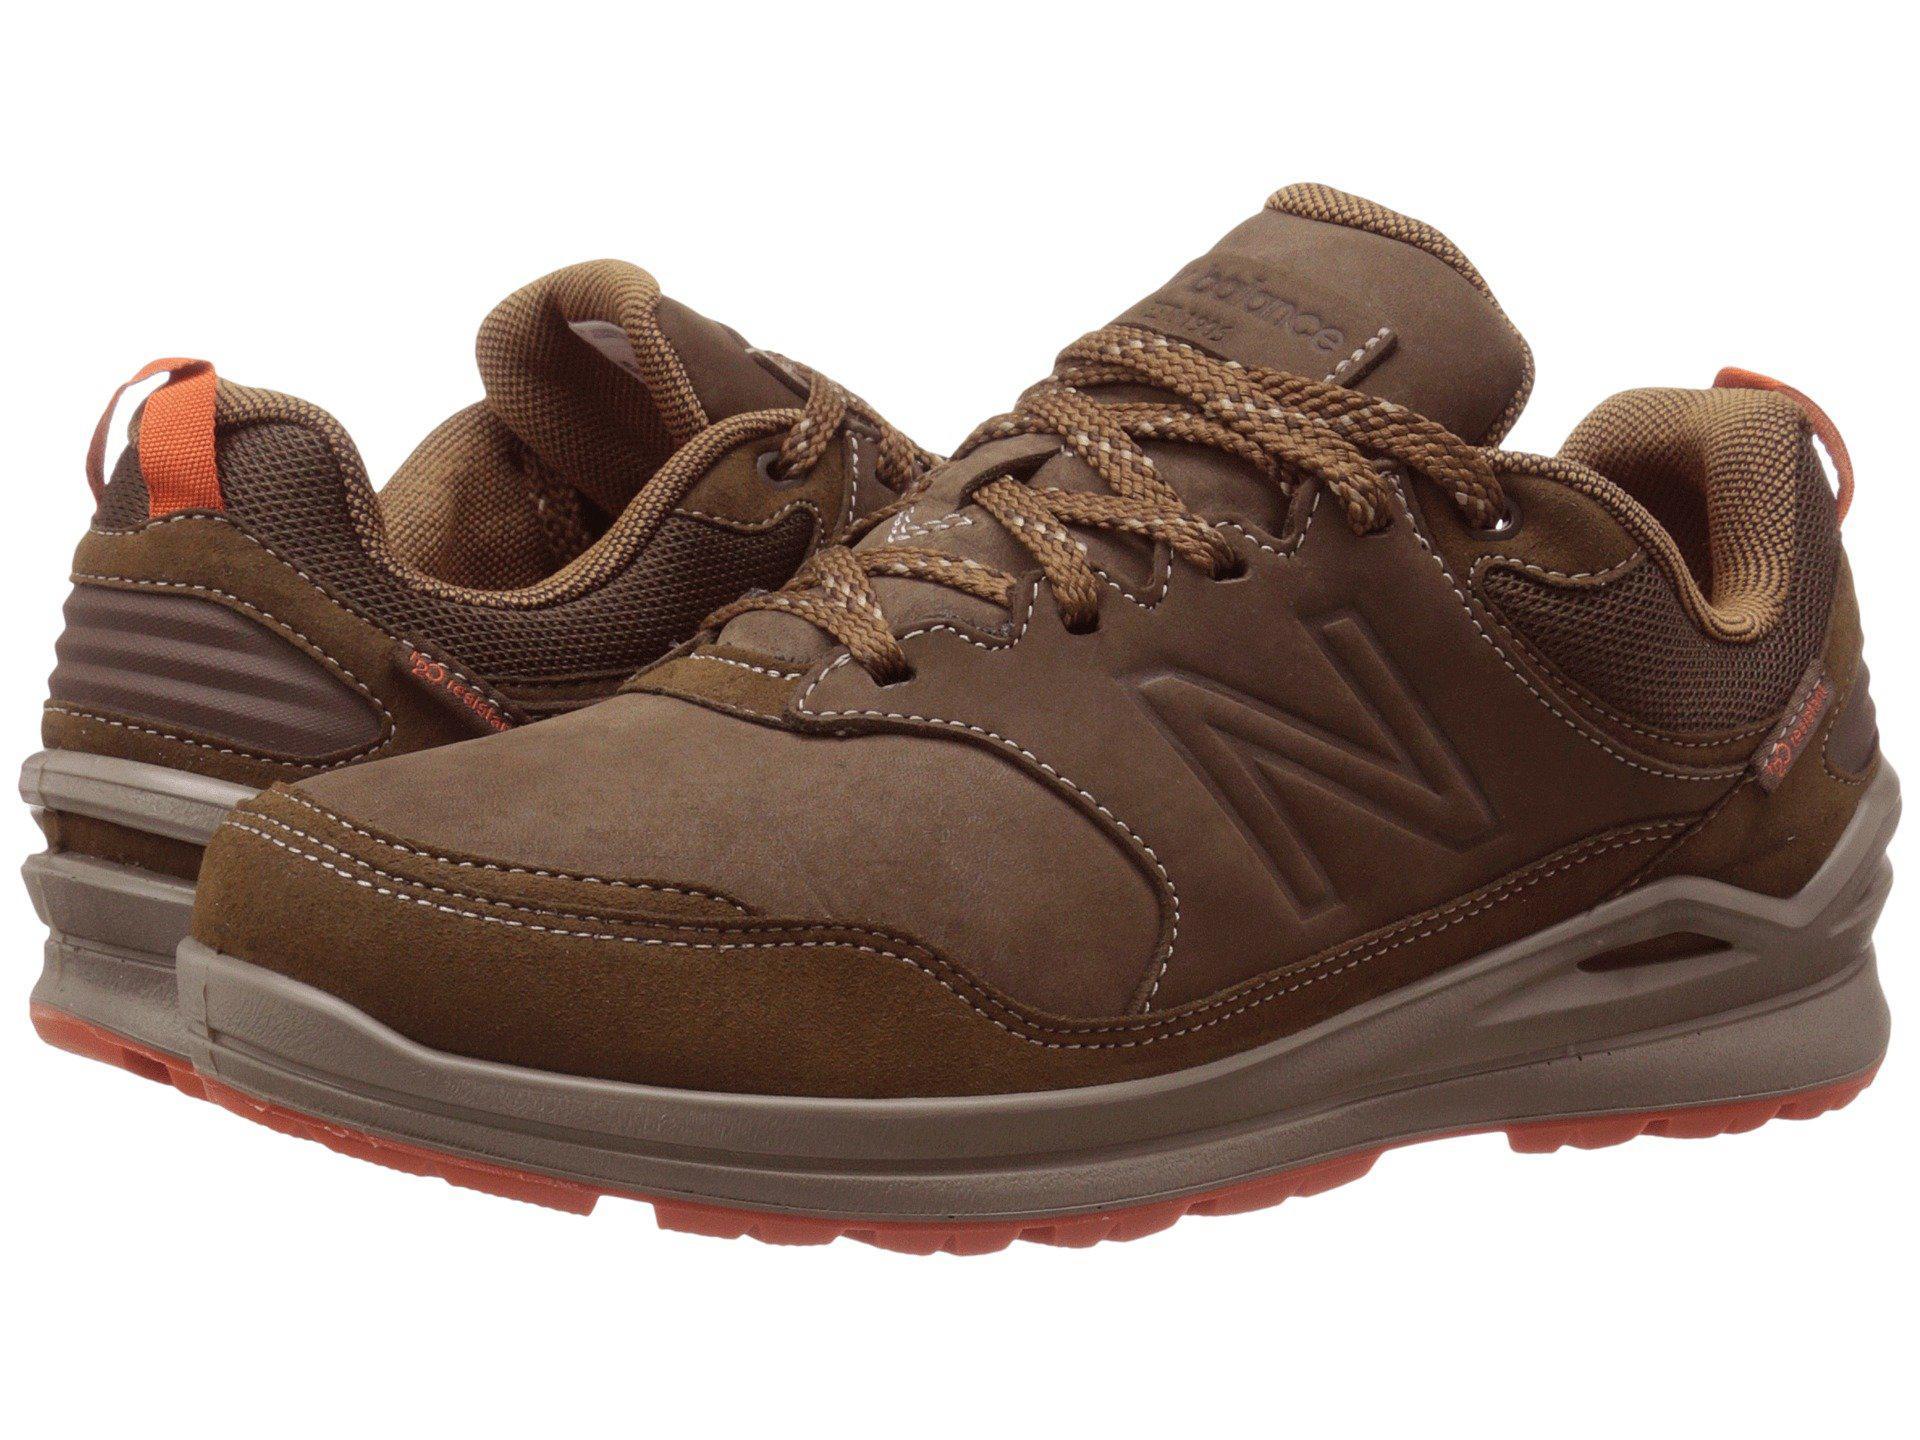 Leather Mw3000 Trail Walking Shoe